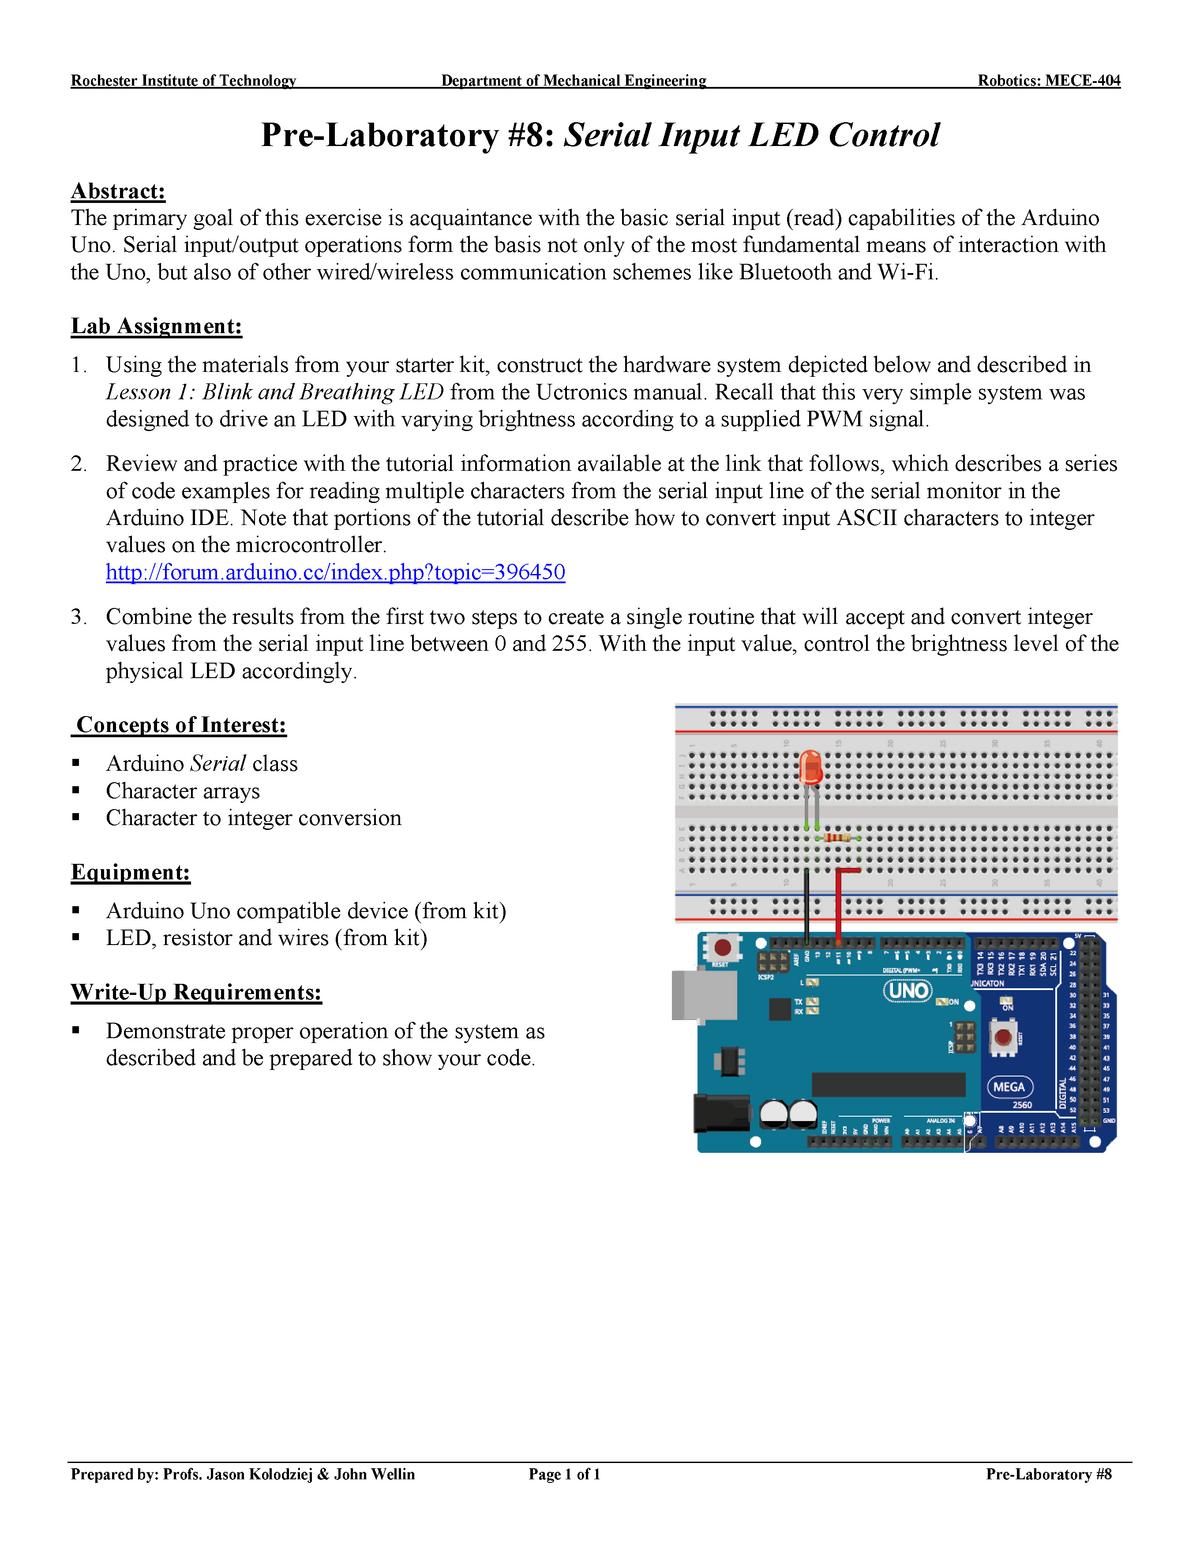 Pre Lab 8 Serial Input LED Control rev0 - 0306 775: Robotics